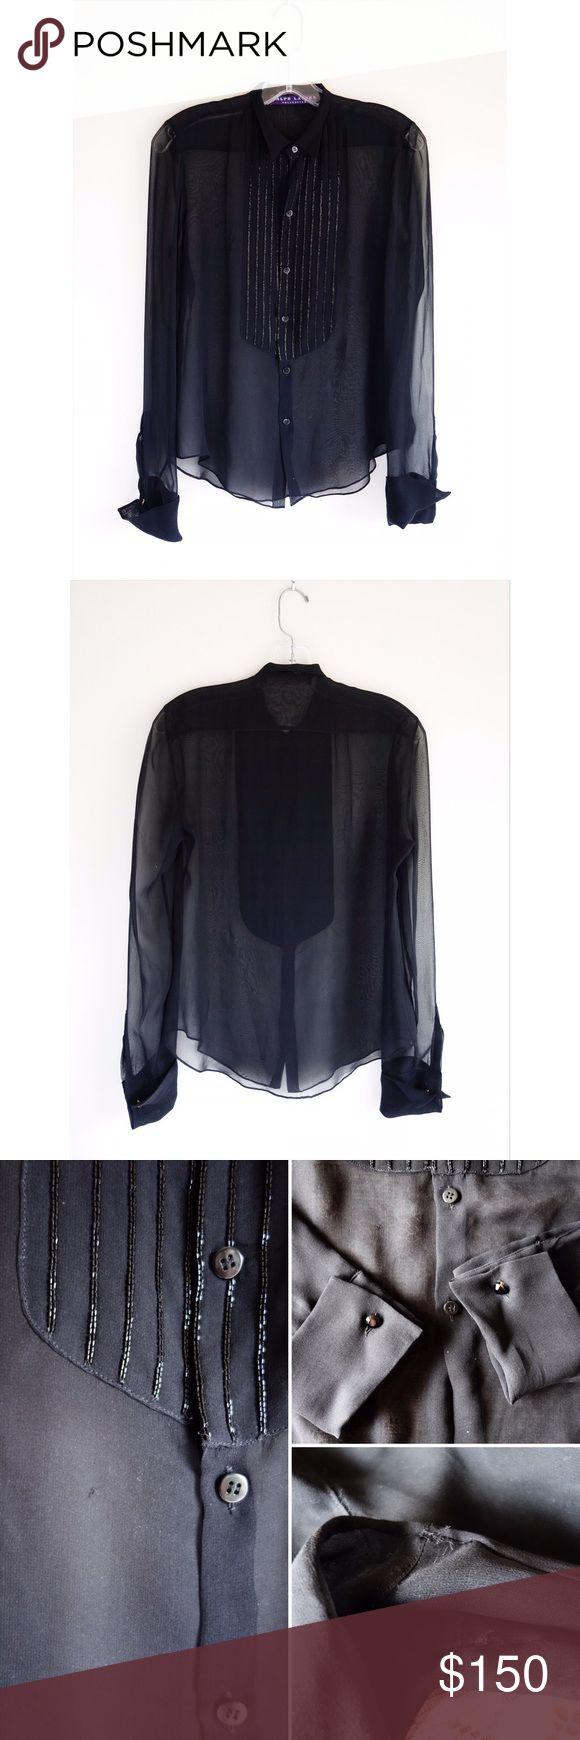 The 25 best black tuxedo shirt ideas on pinterest black for Tuxedo shirt black buttons